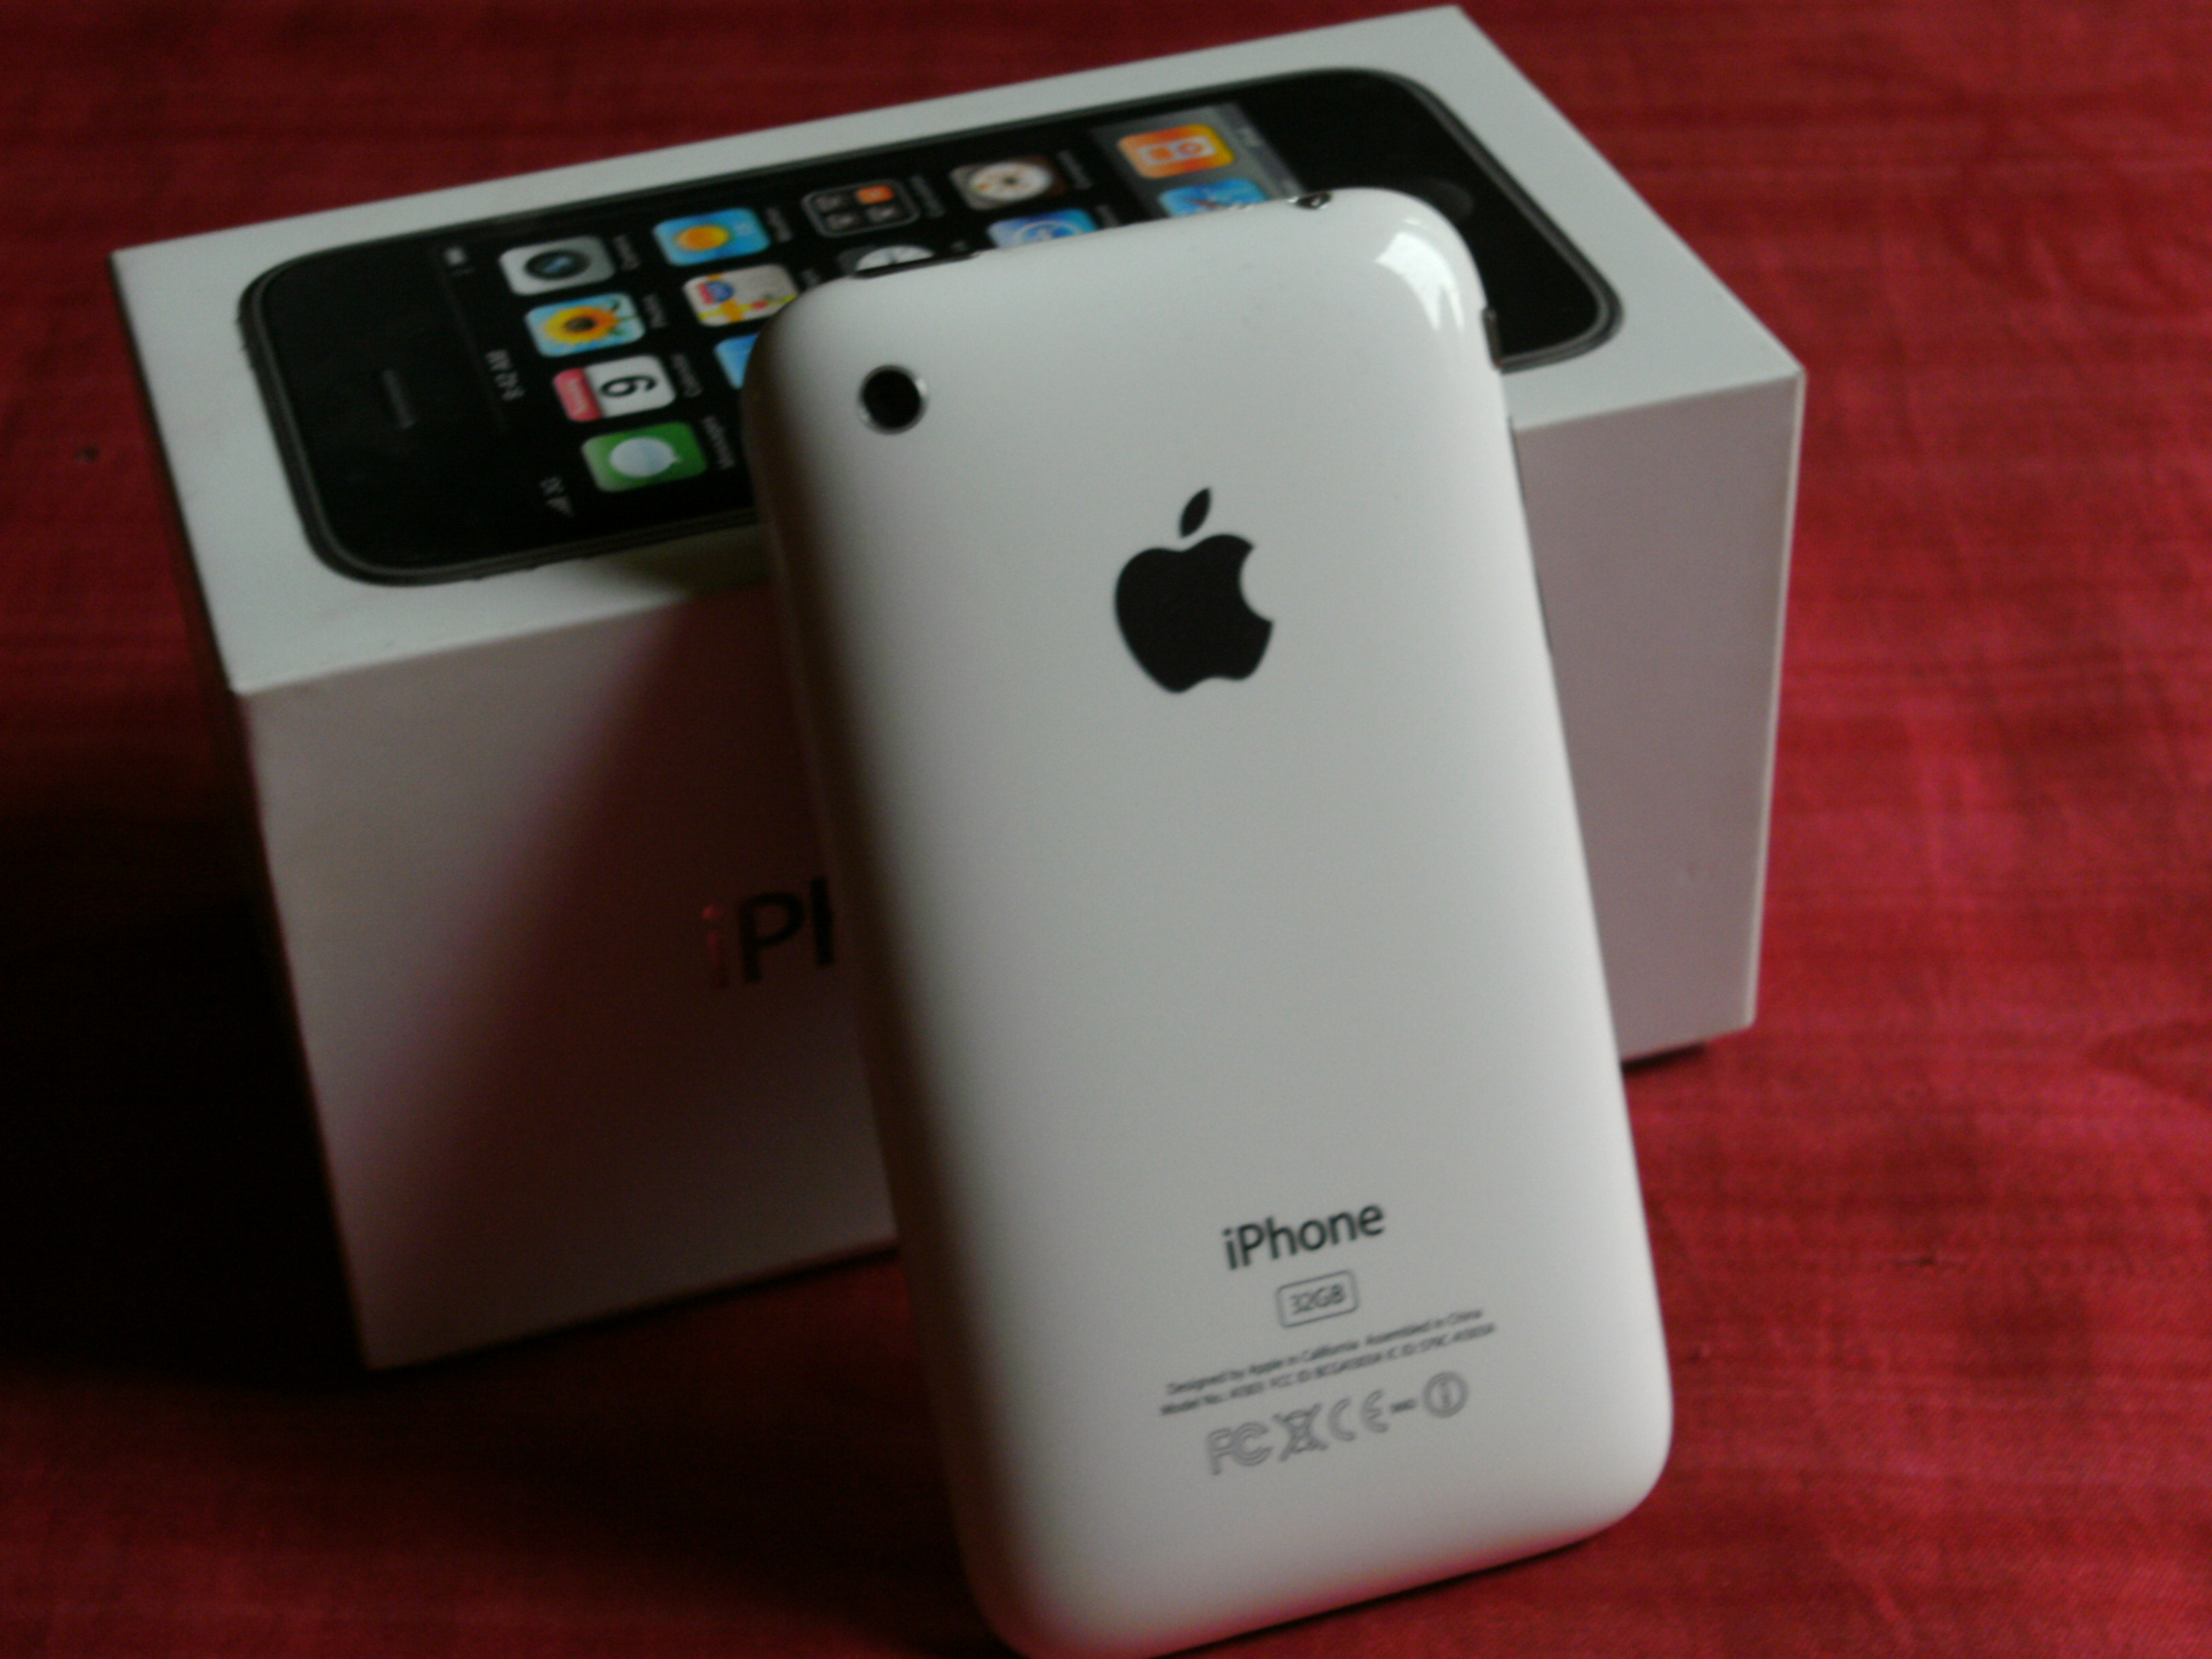 Folie Iphone S